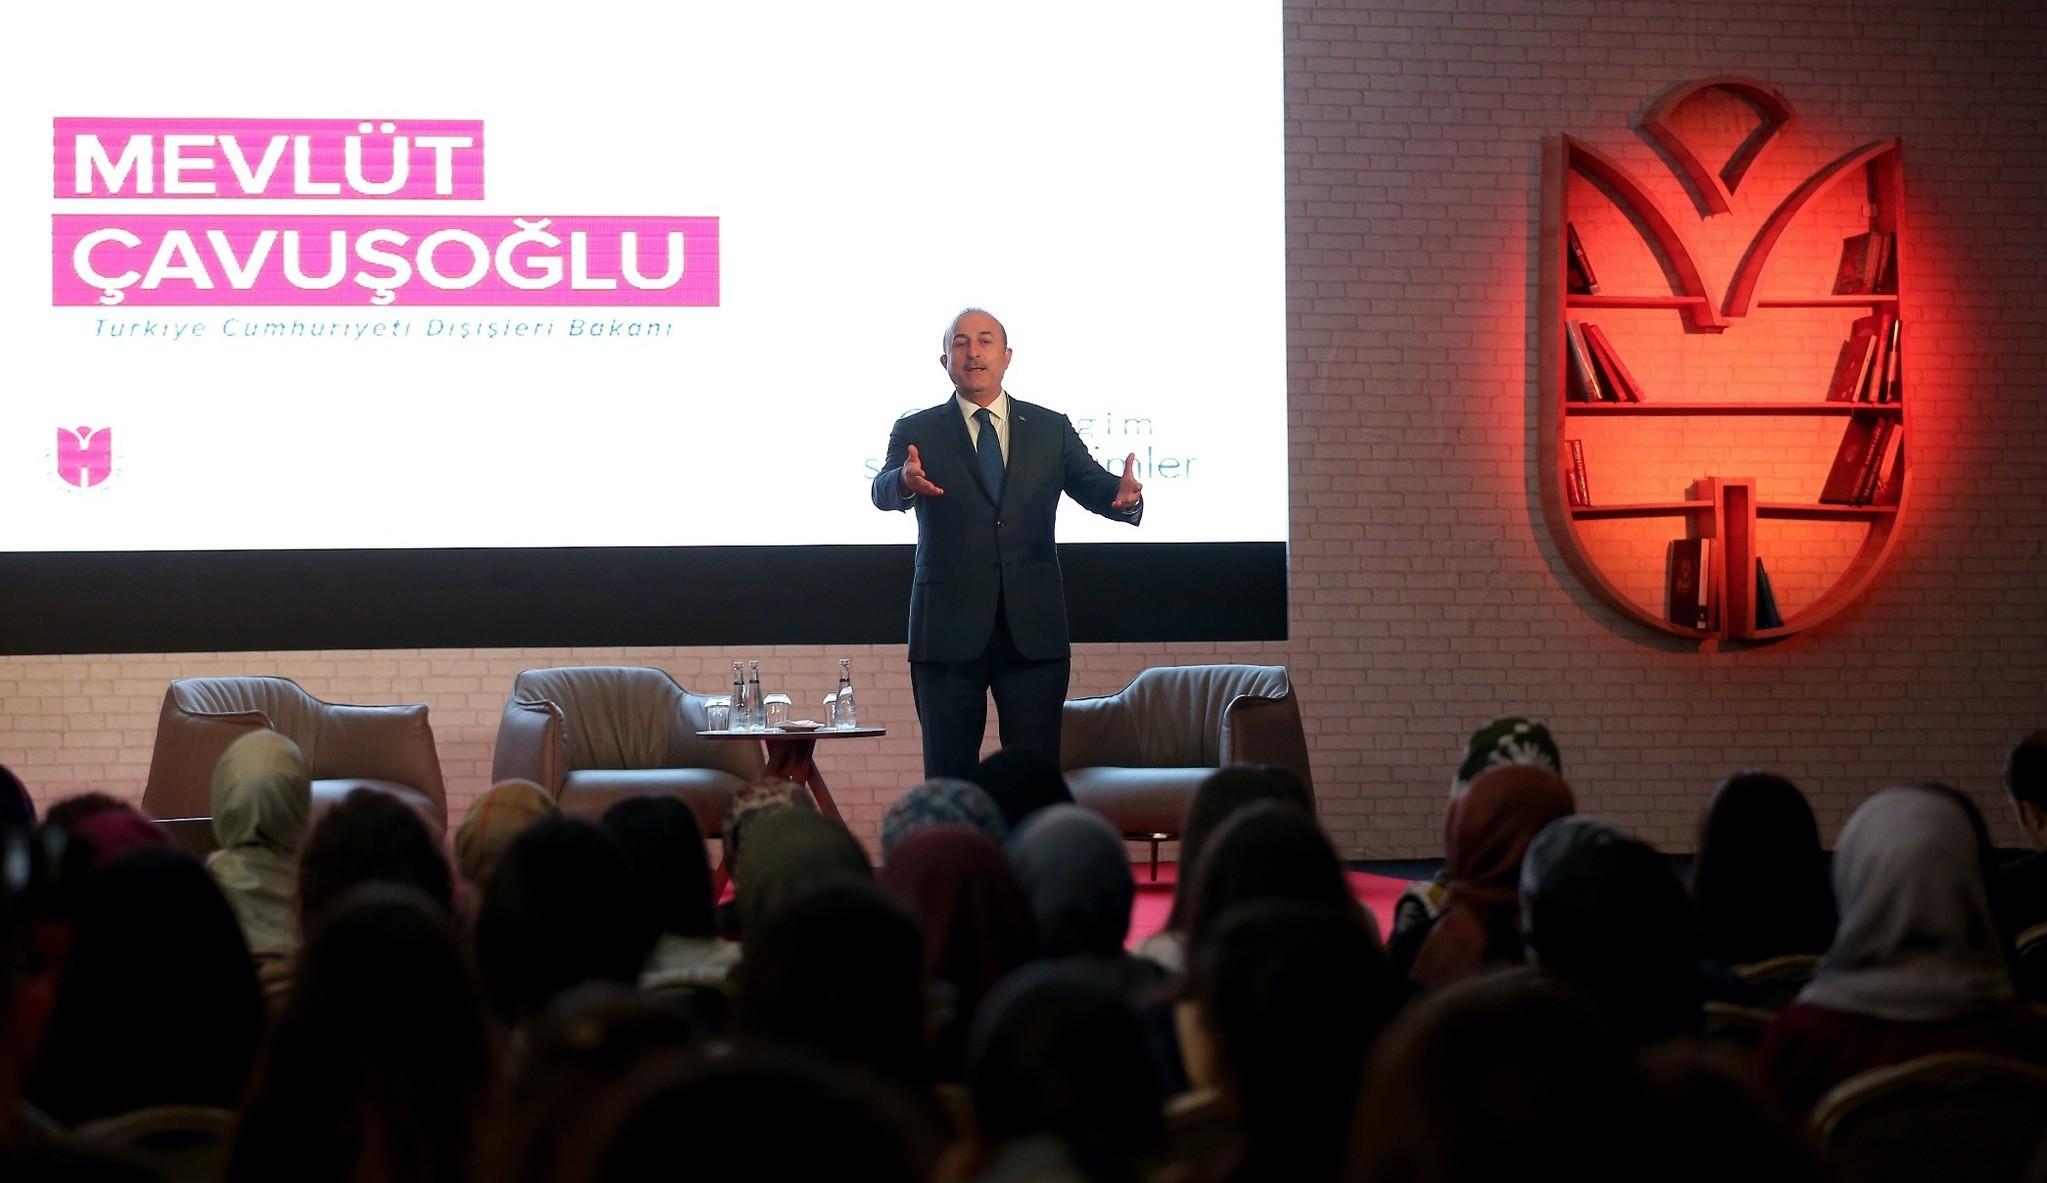 u00c7avuu015fou011flu speaking at a panel held by Ibn Haldun University yesterday, Istanbul.